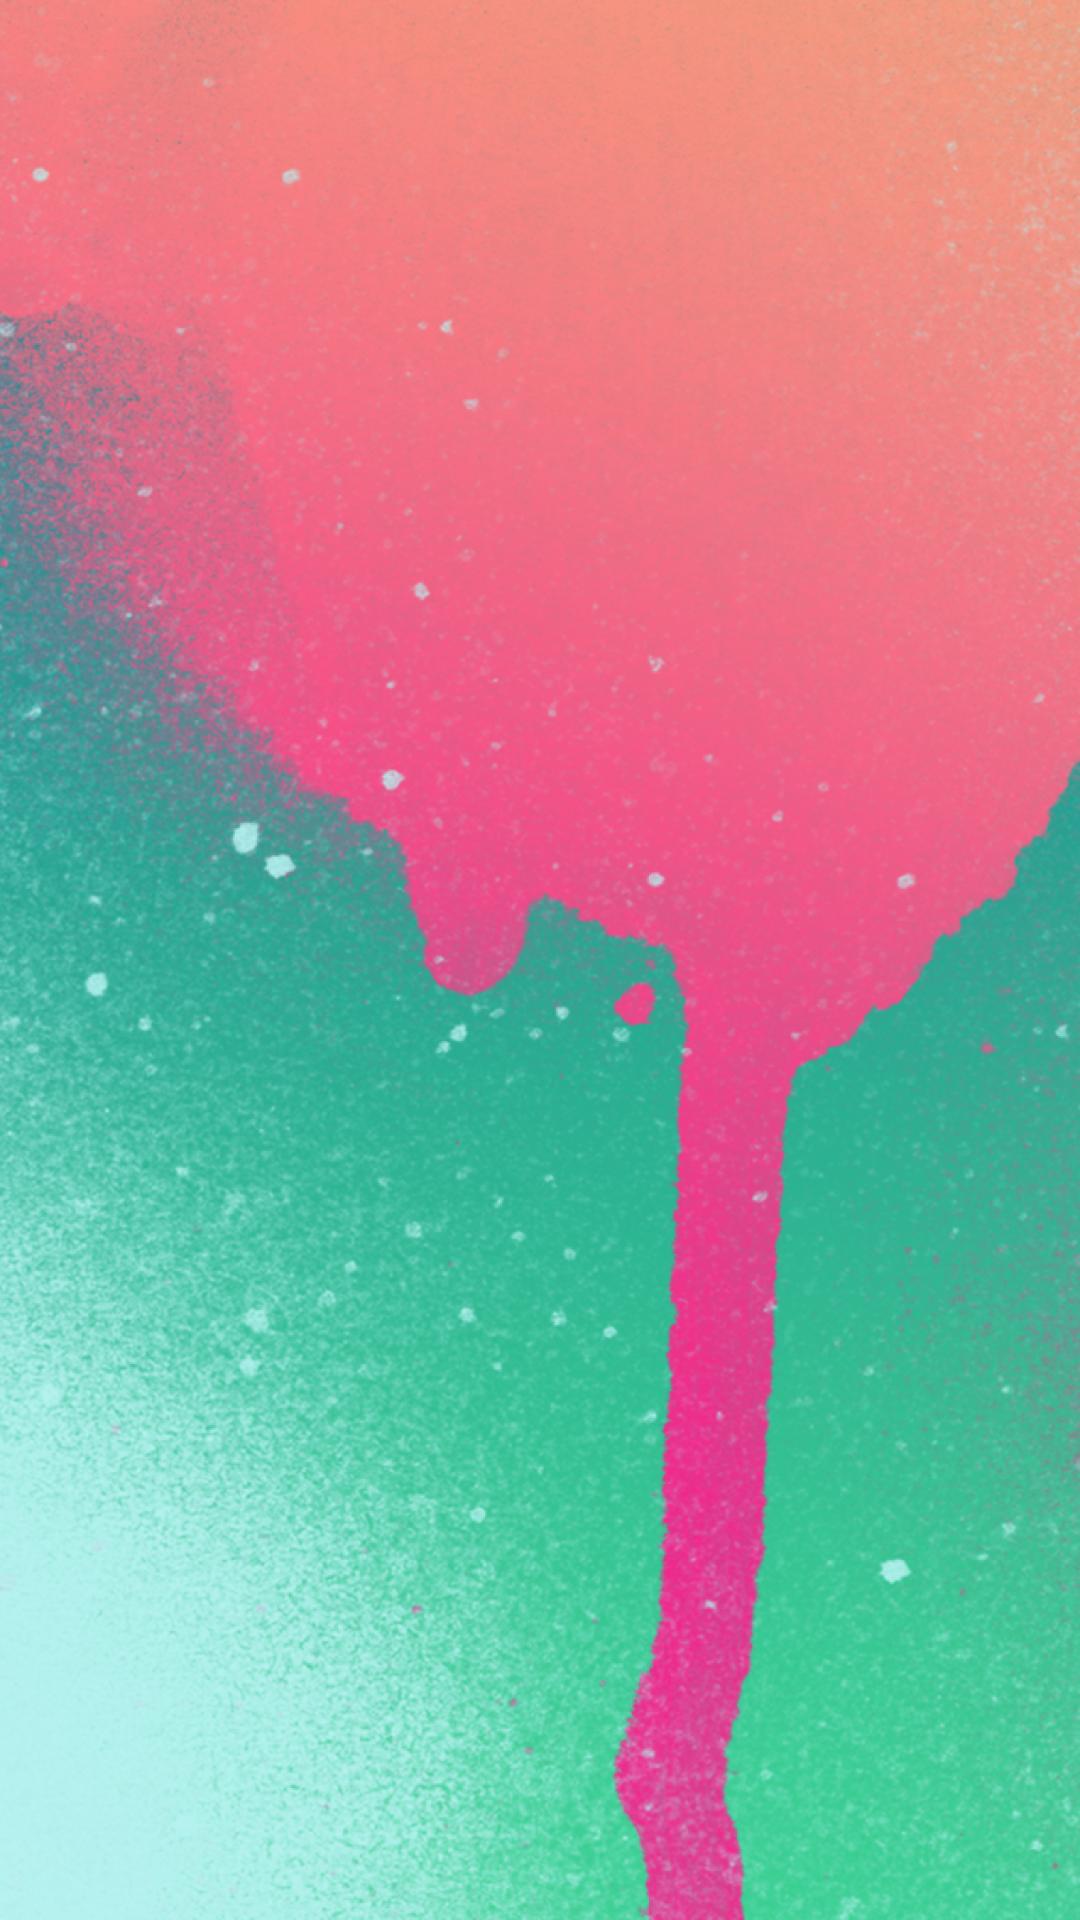 Teal Splatter iPhone Wallpaper